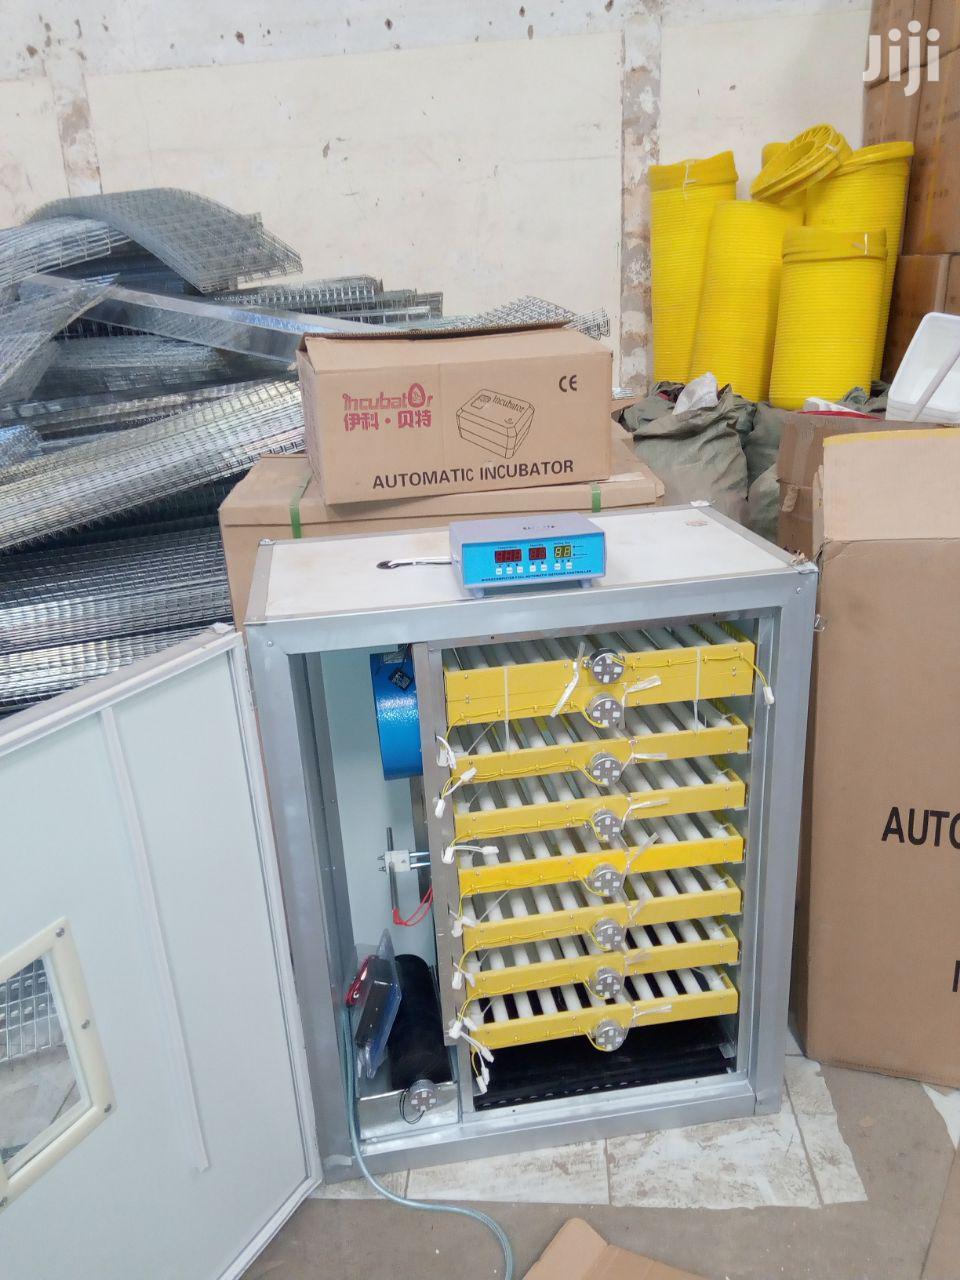 500 Ac/Dc Eggs Incubator